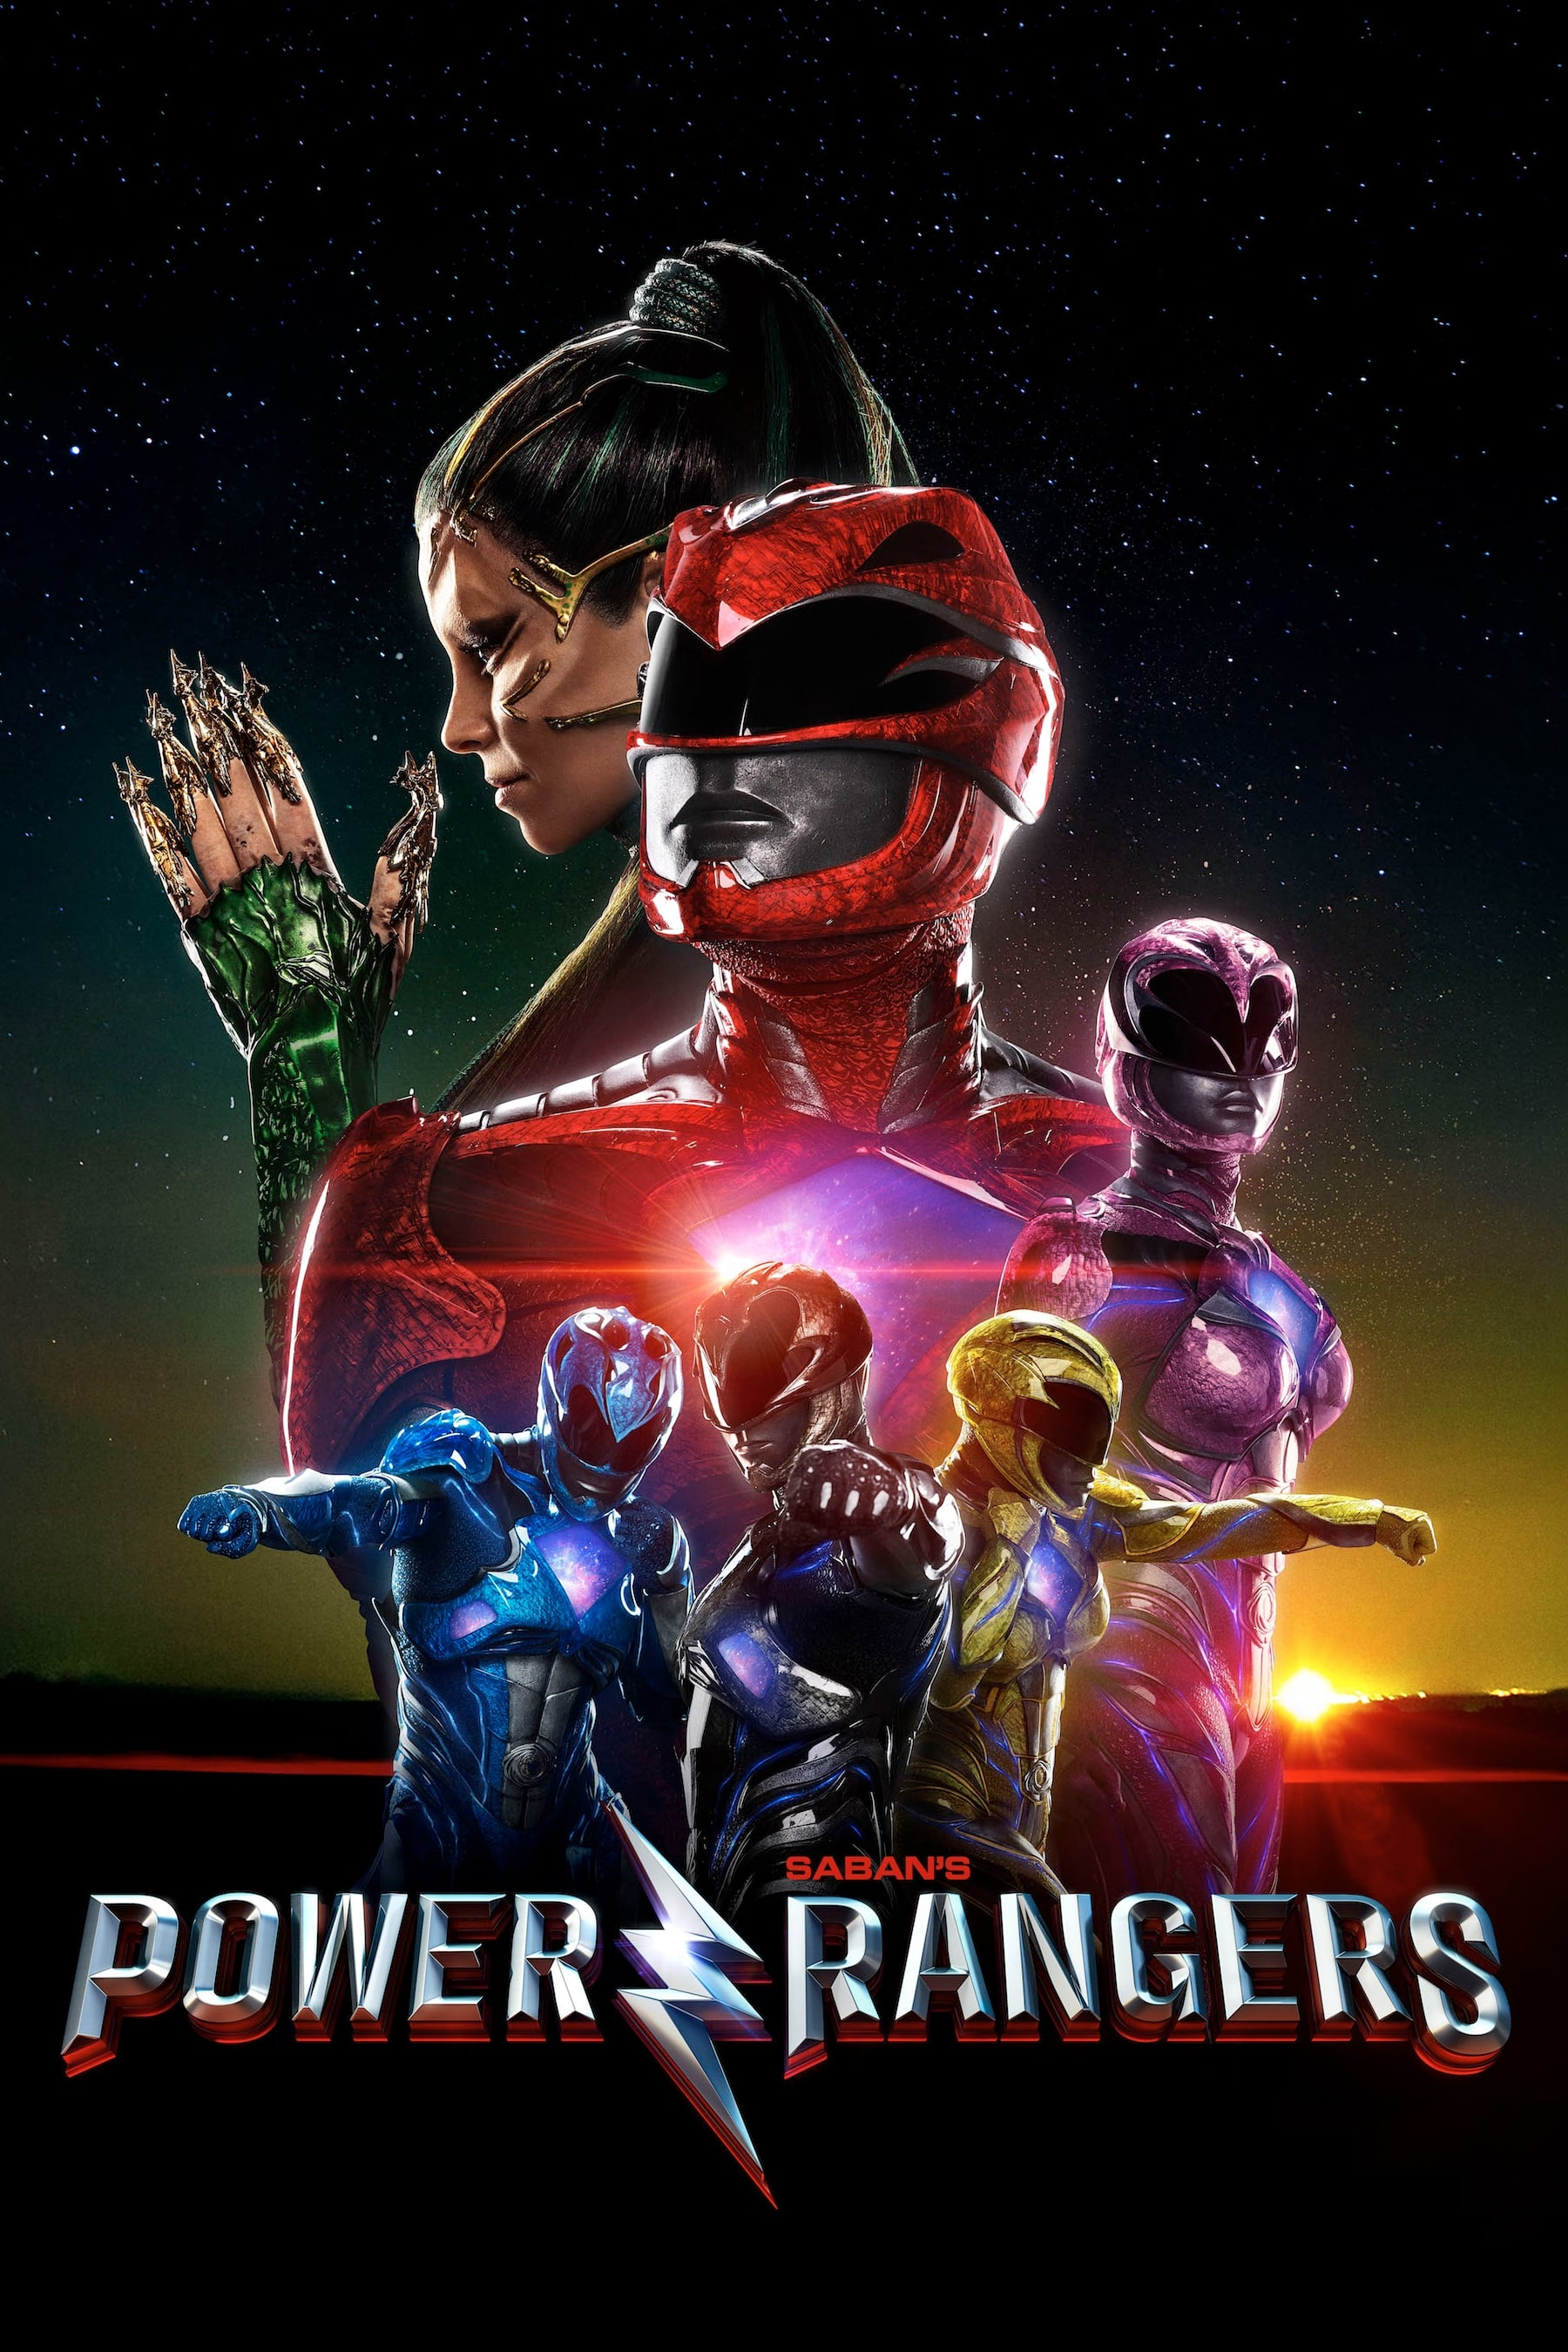 Power Rangers Película Completa HD 1080p [MEGA] [LATINO]